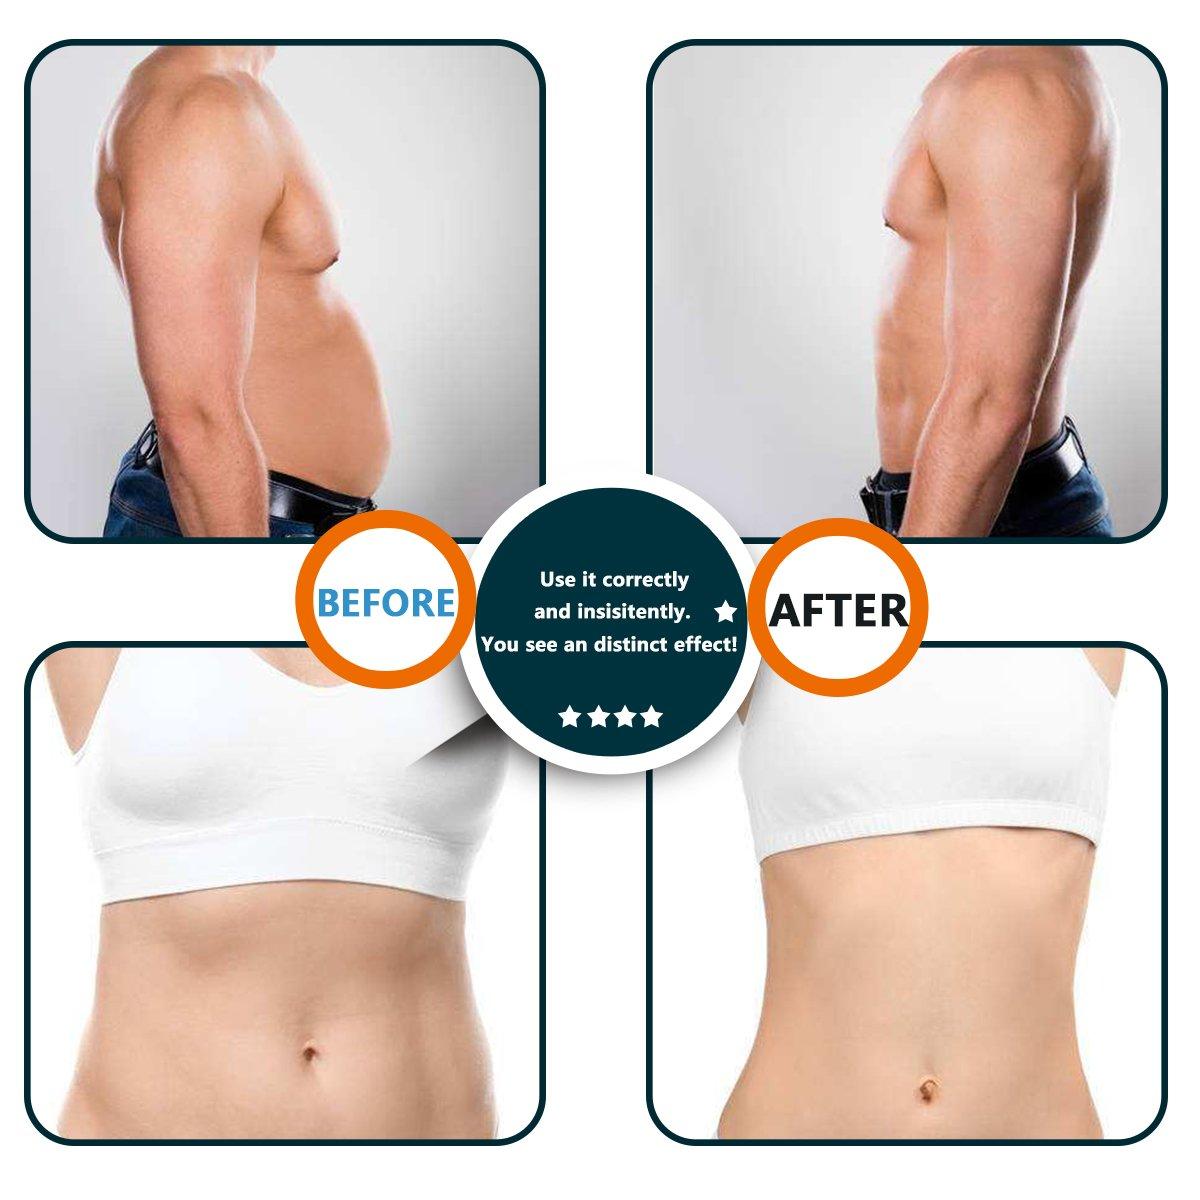 ABS Stimulator Trainer Fitness Workout Abdominal Toning Belt Muscle Toner 10 Gel